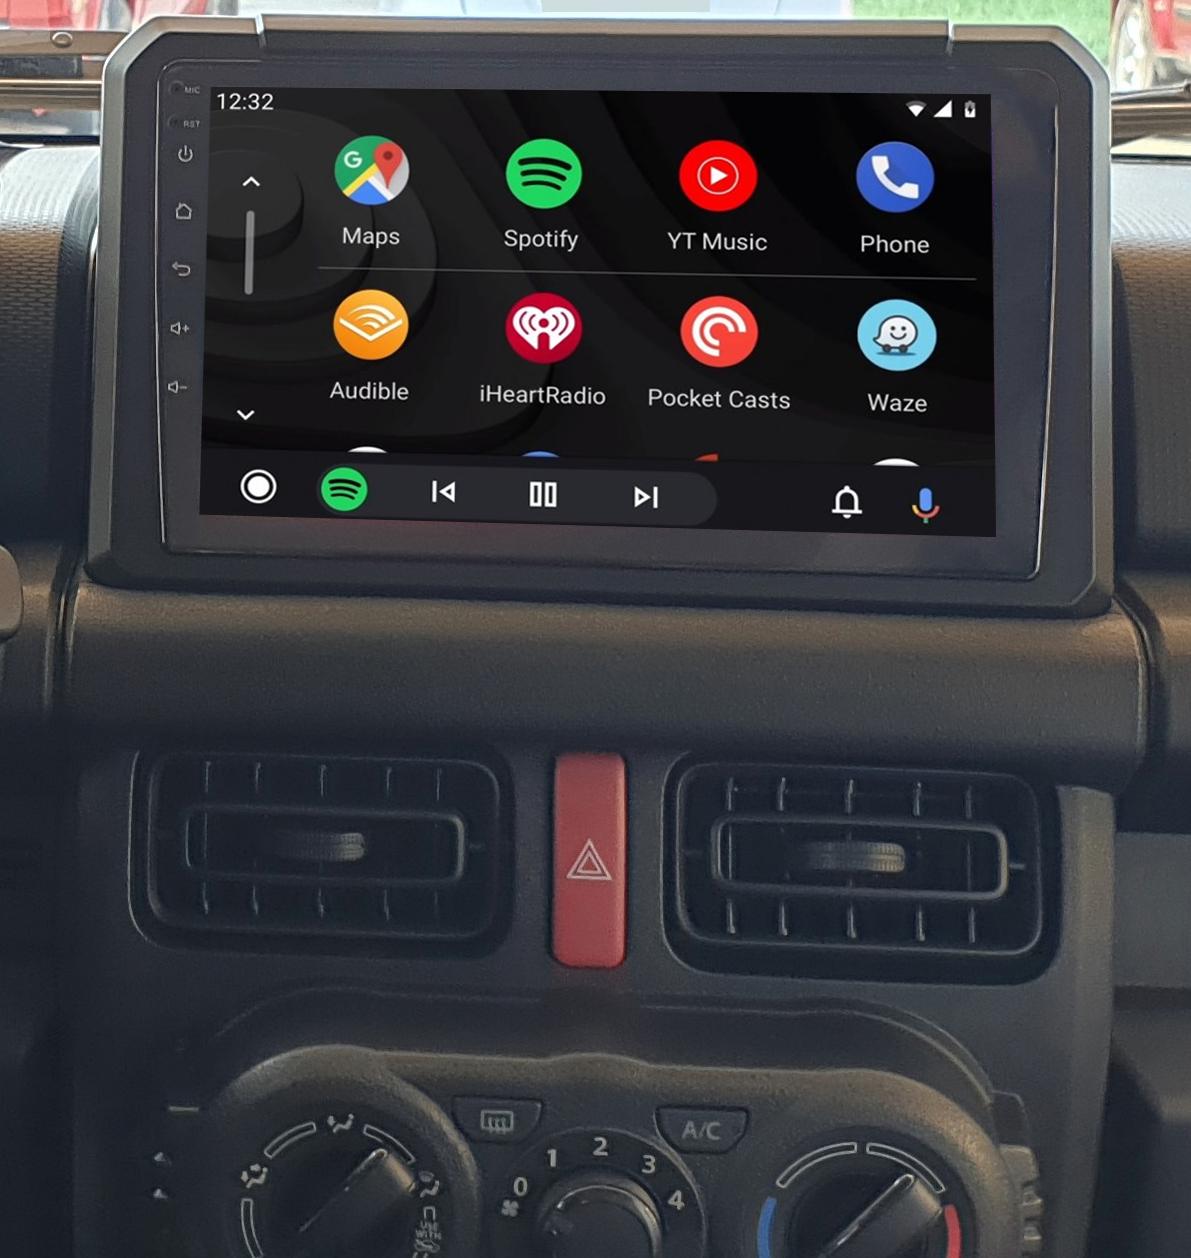 Ecran tactile QLED Android 11.0 + Apple Carplay sans fil Suzuki Jimny depuis 2019